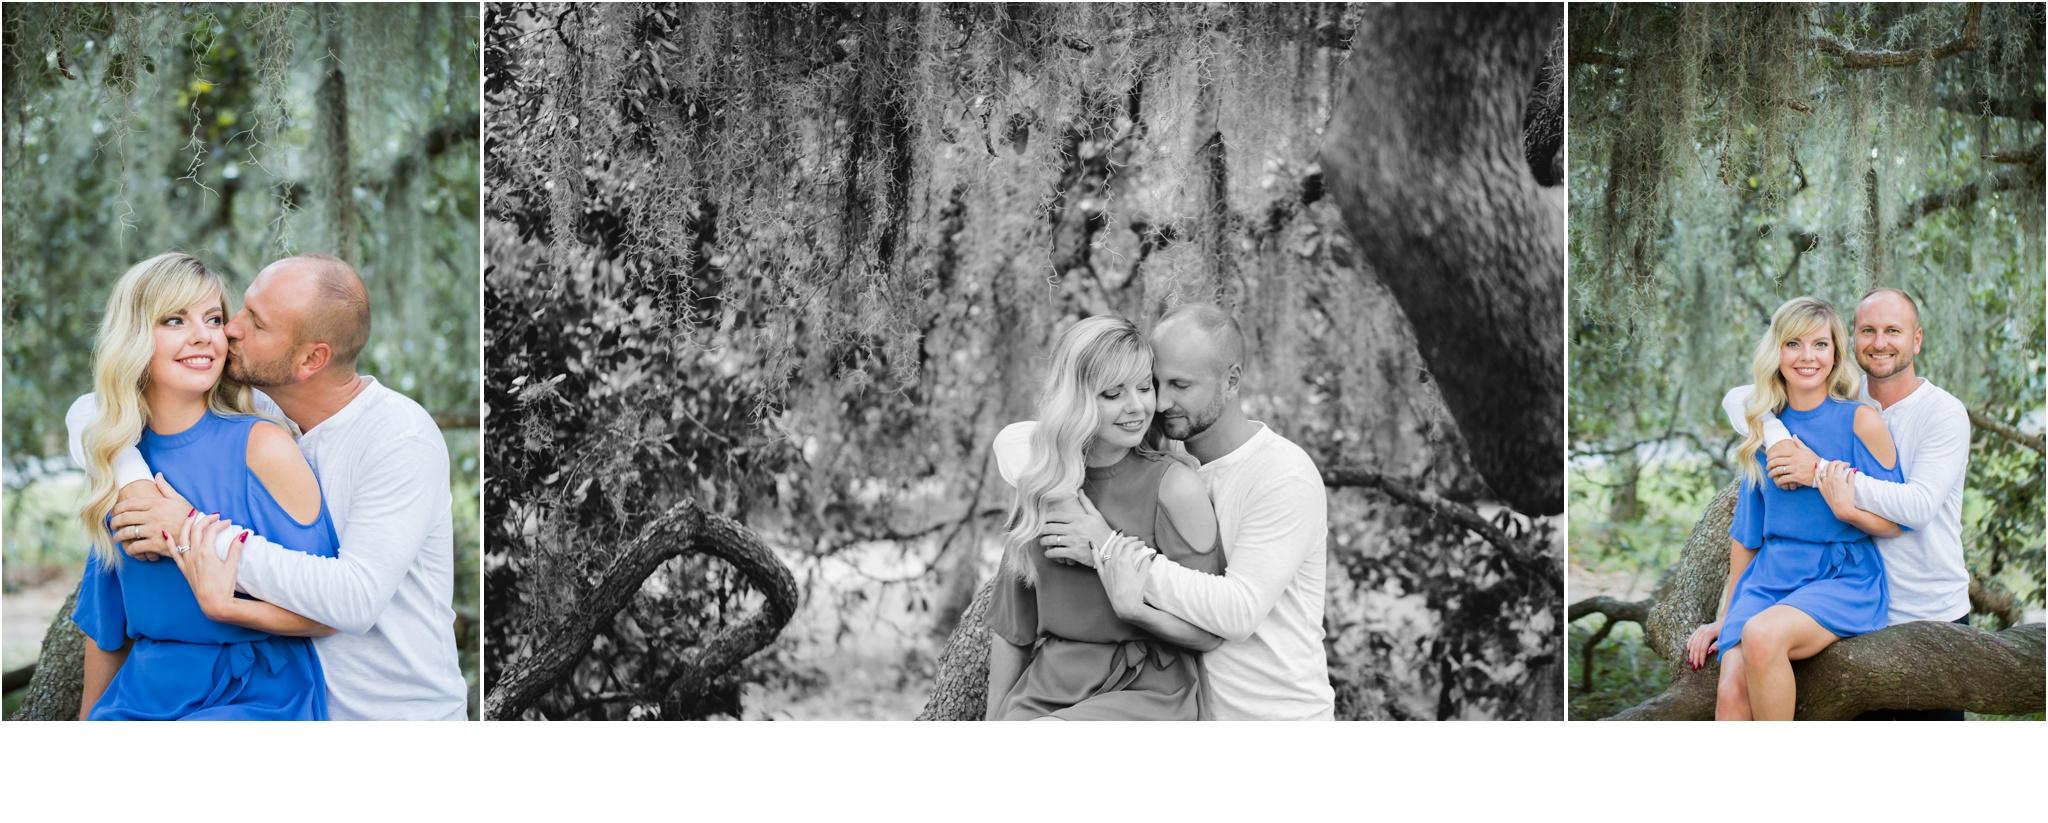 Rainey_Gregg_Photography_St._Simons_Island_Georgia_California_Wedding_Portrait_Photography_0257.jpg